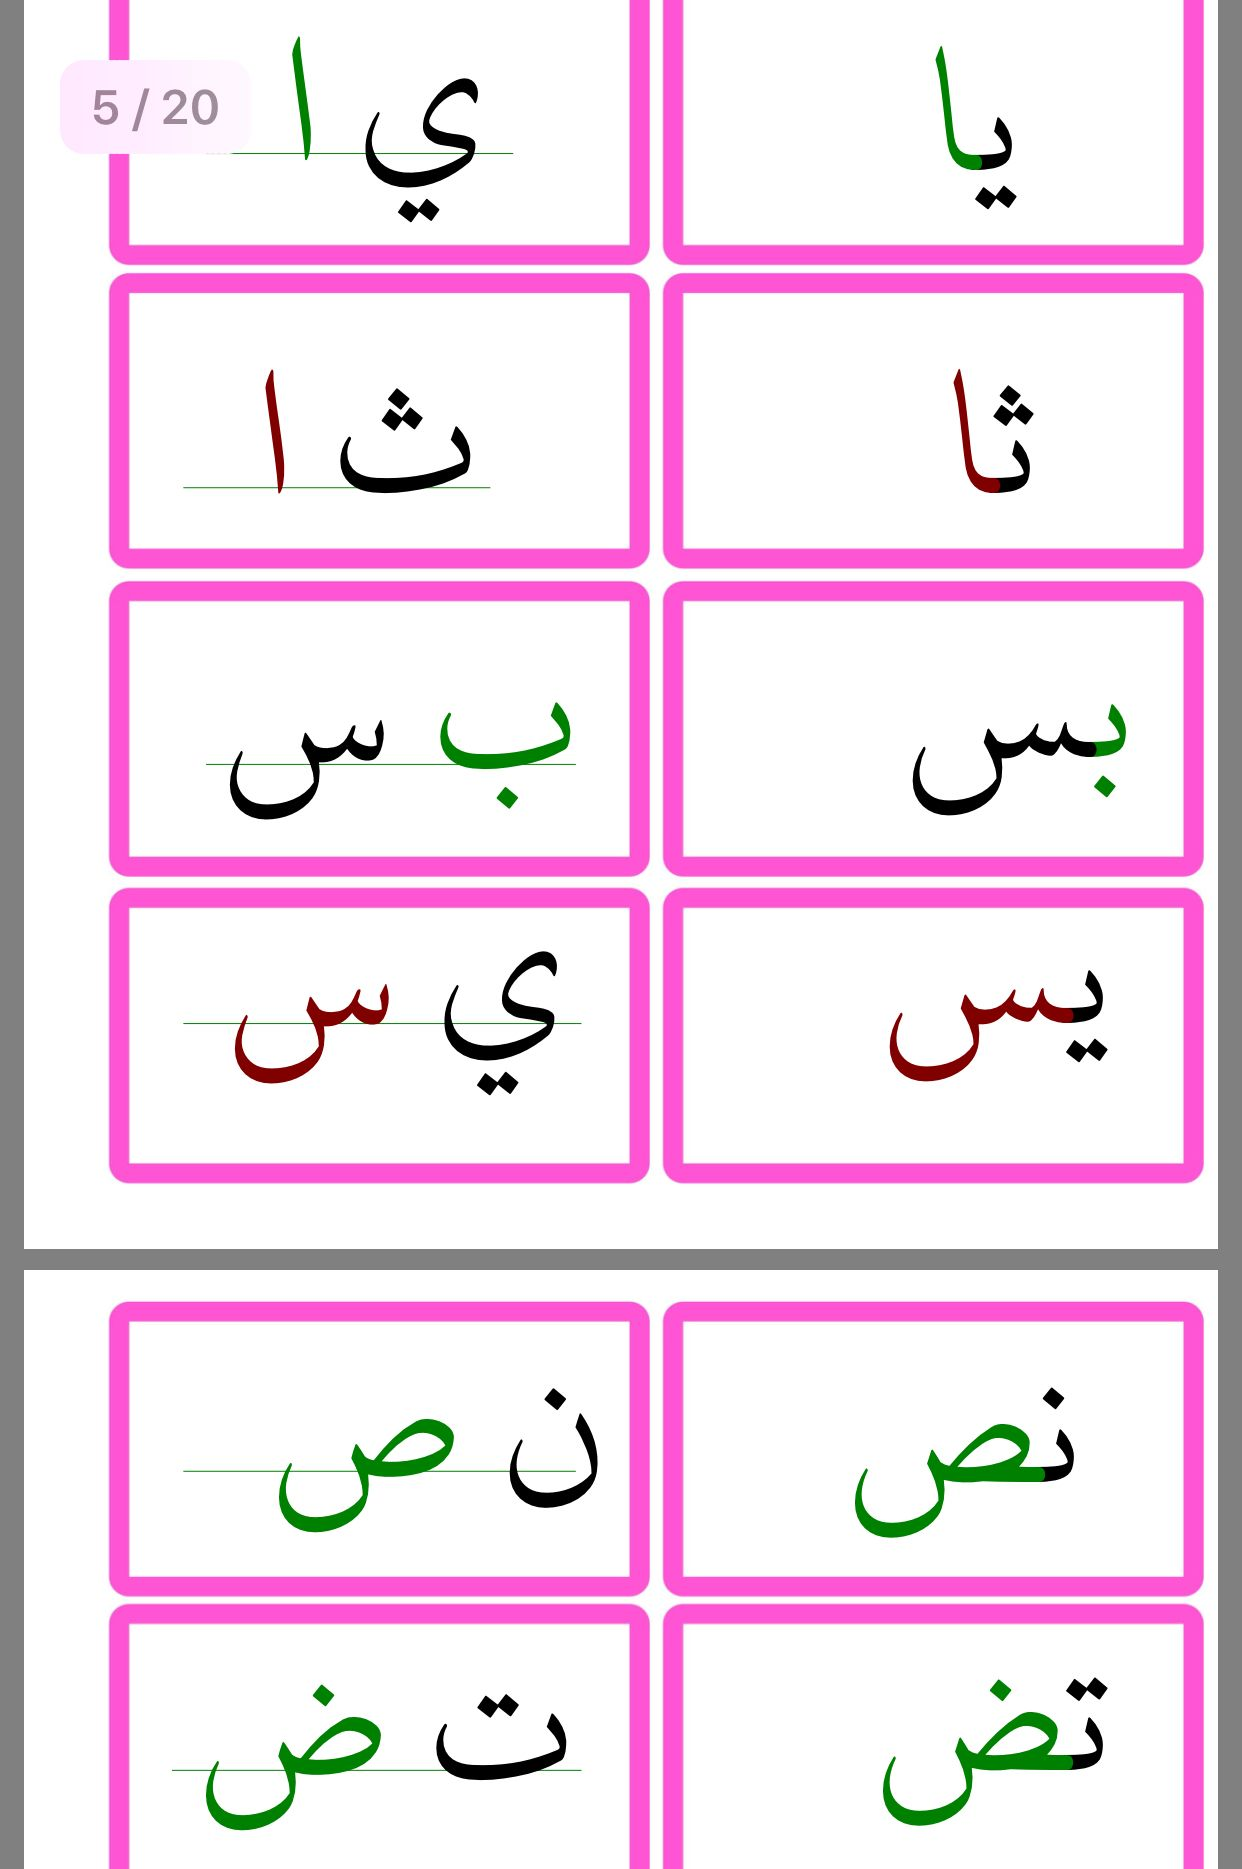 Pin By Abdulwahab K On Alphabet Arabe Arabic Alphabet For Kids Arabic Alphabet Letters Arabic Alphabet